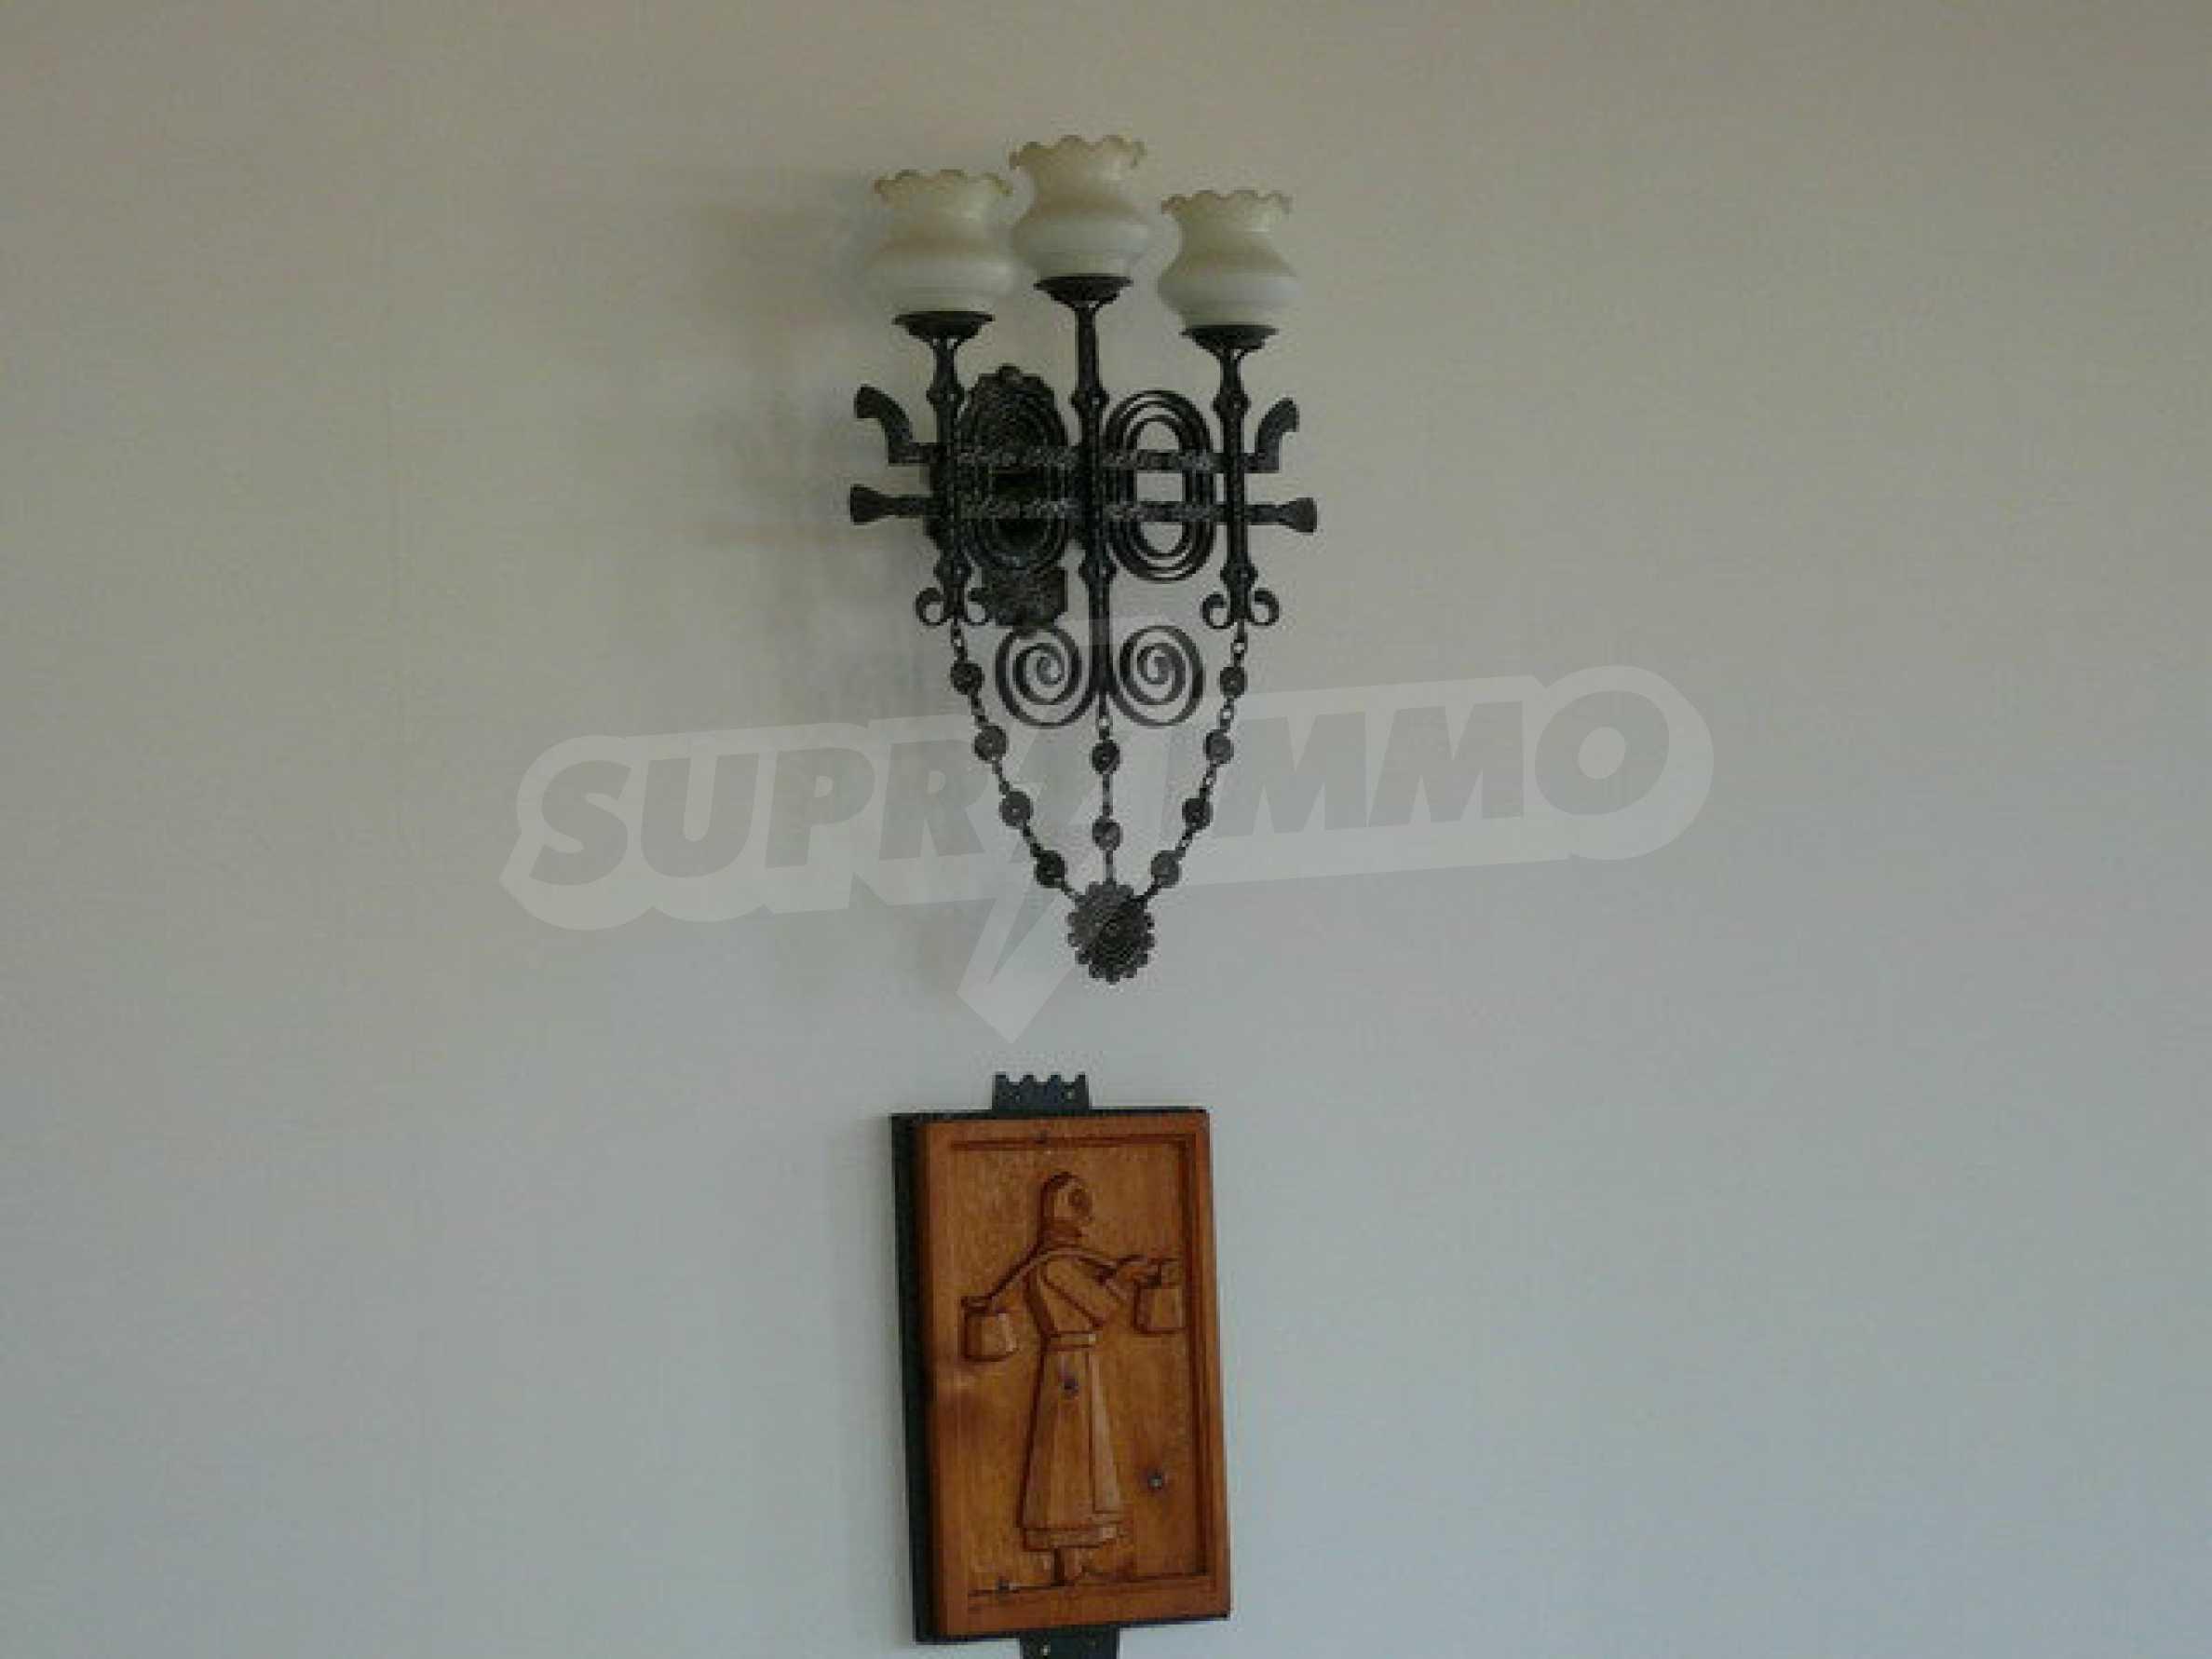 Renoviertes Haus nur 3 km von Veliko Tarnovo entfernt 30